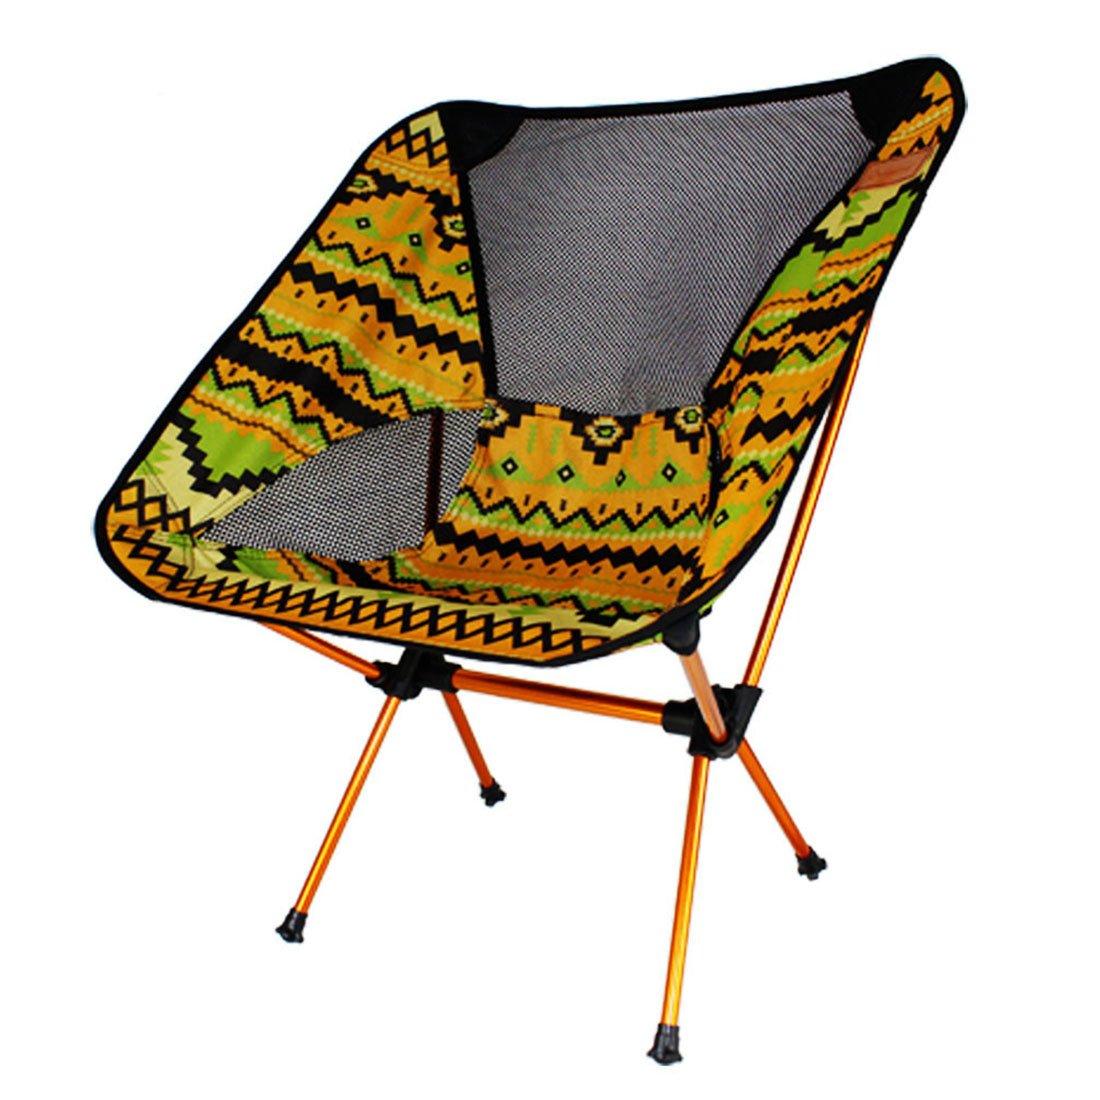 【GINGER掲載商品】 GFL椅子アウトドアキャンプ折りたたみ椅子ポータブル背もたれウルトラライトレジャー椅子荷重を受ける125 B07DLWXQGR A kg (A + (A + +) A B07DLWXQGR, オオマガリシ:ca8572b7 --- arianechie.dominiotemporario.com